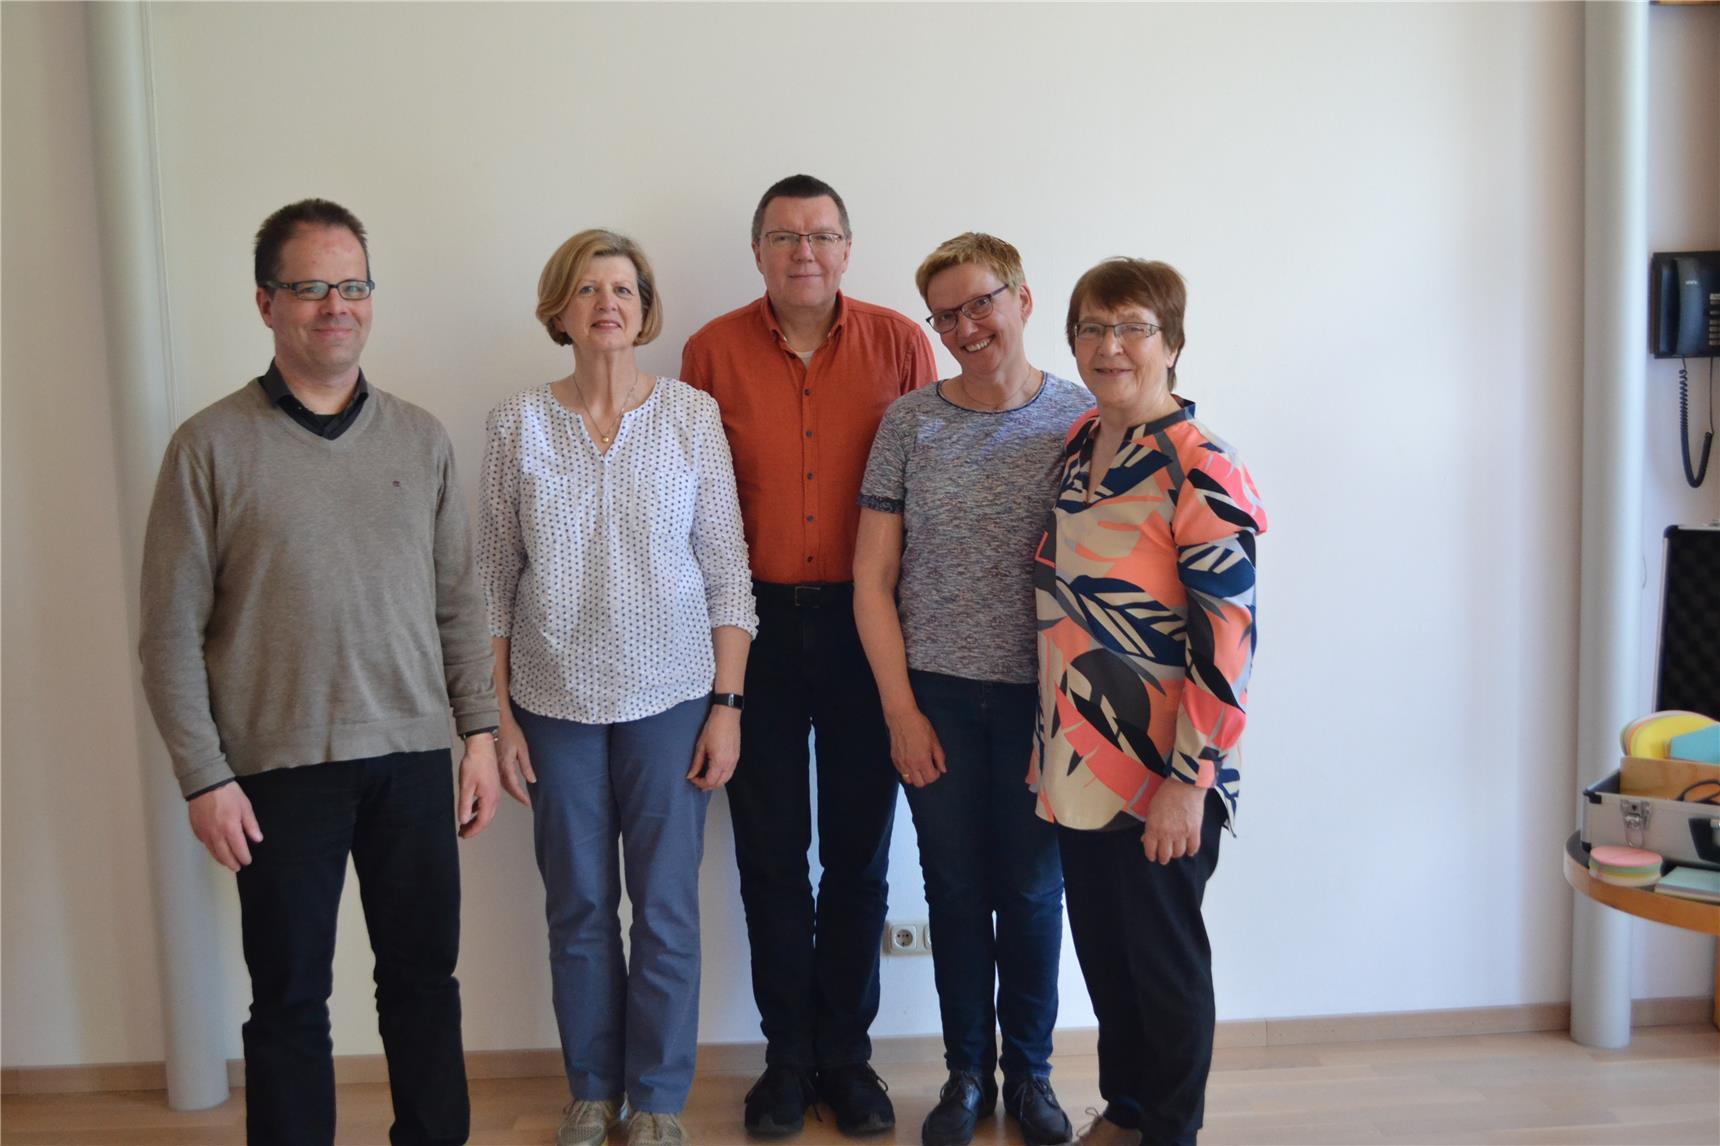 3-2019 Feldkirch aktuell - Stadt Feldkirch